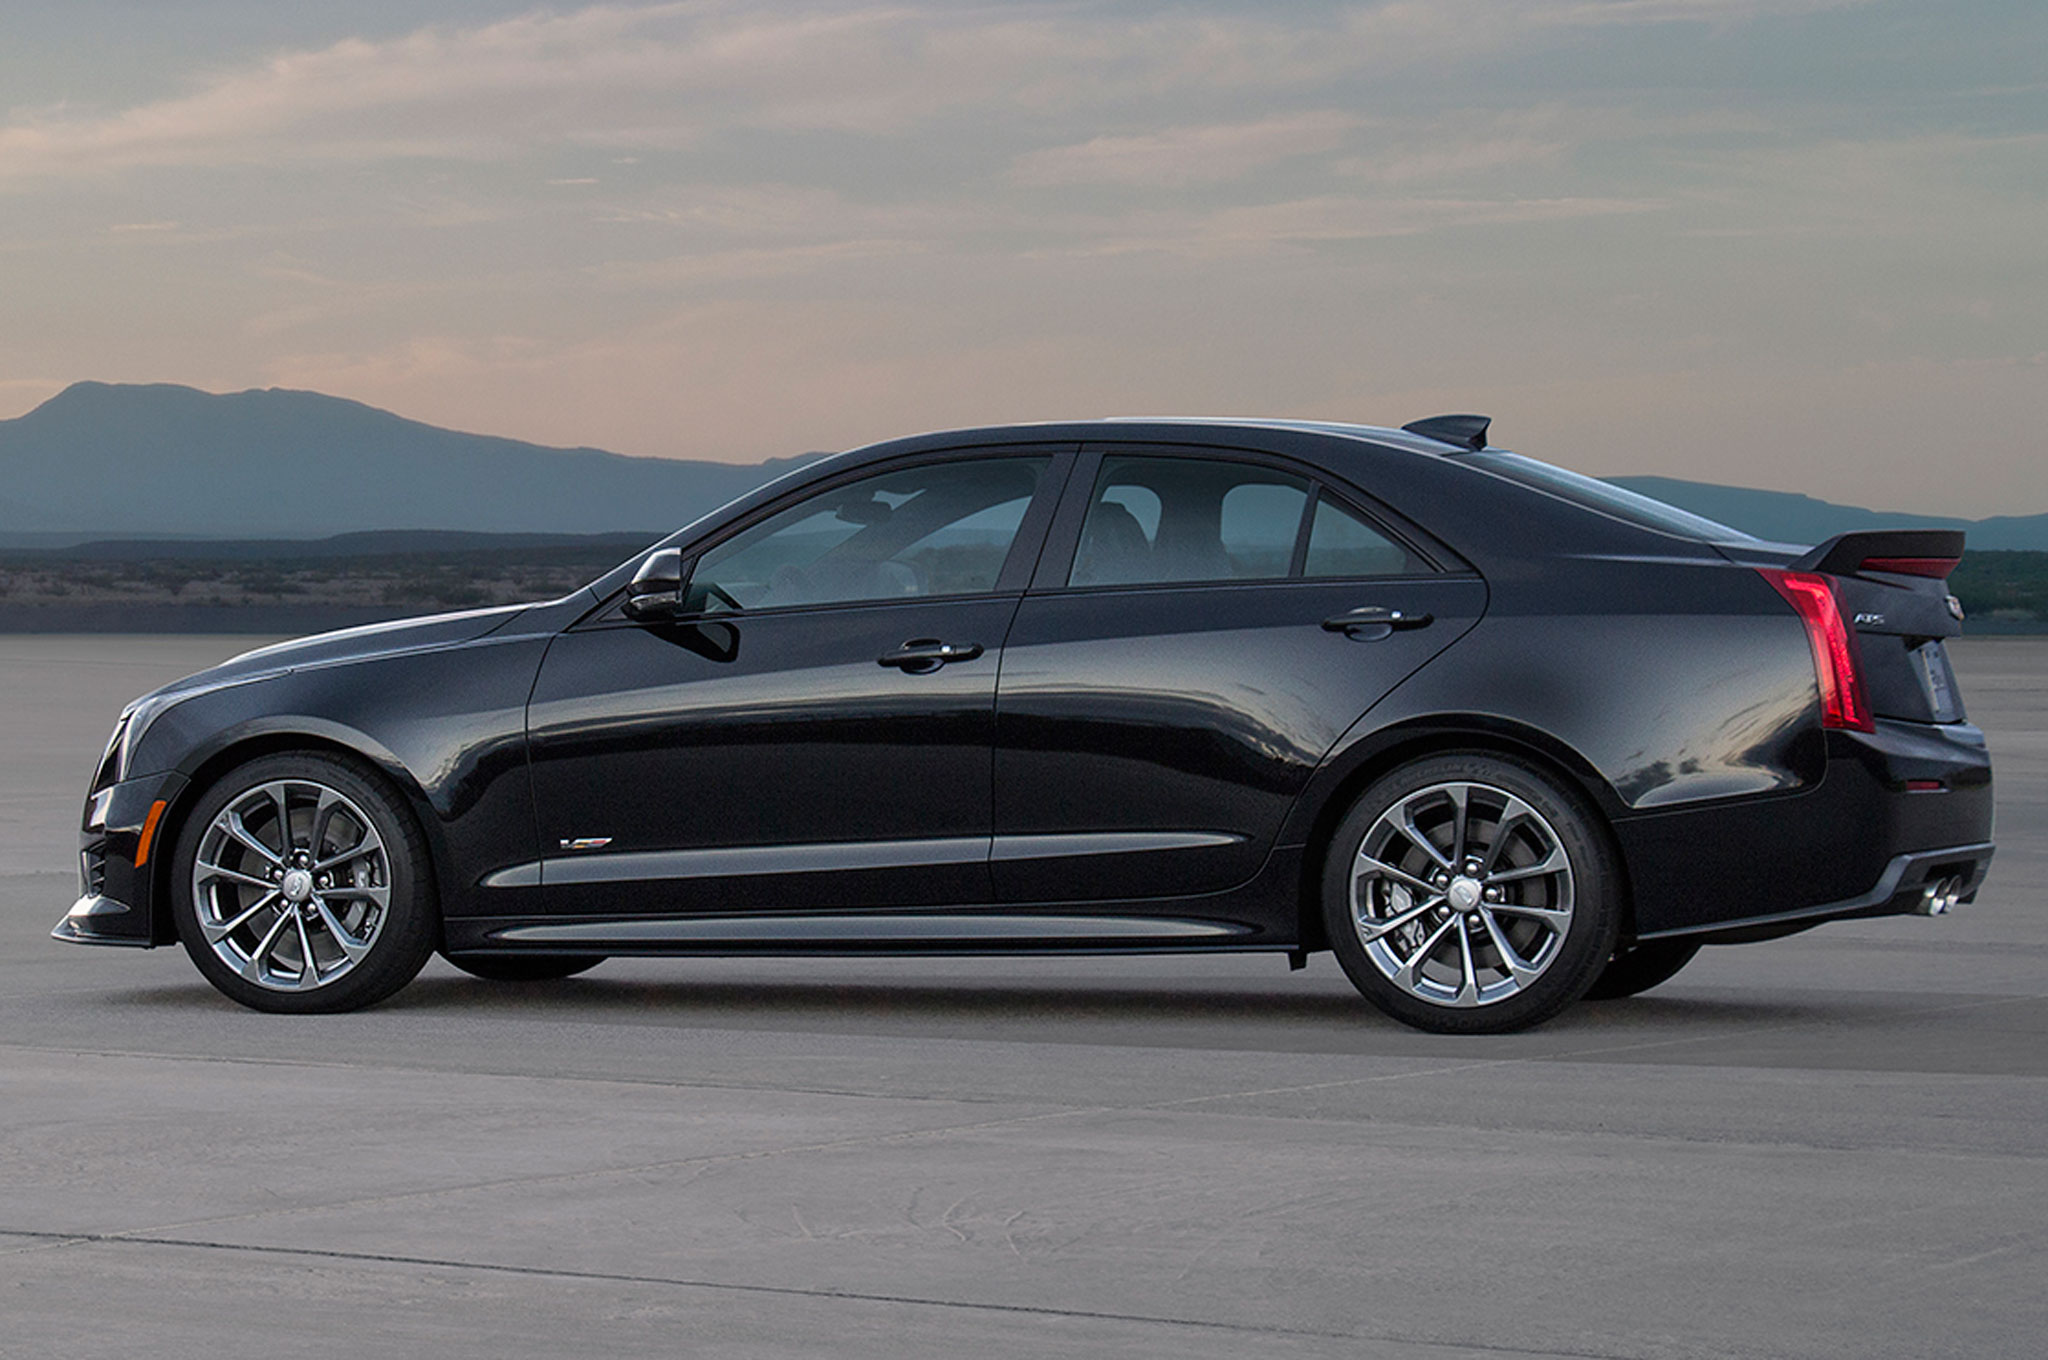 2016 cadillac ats v horsepower sae rated at 464 hp. Black Bedroom Furniture Sets. Home Design Ideas